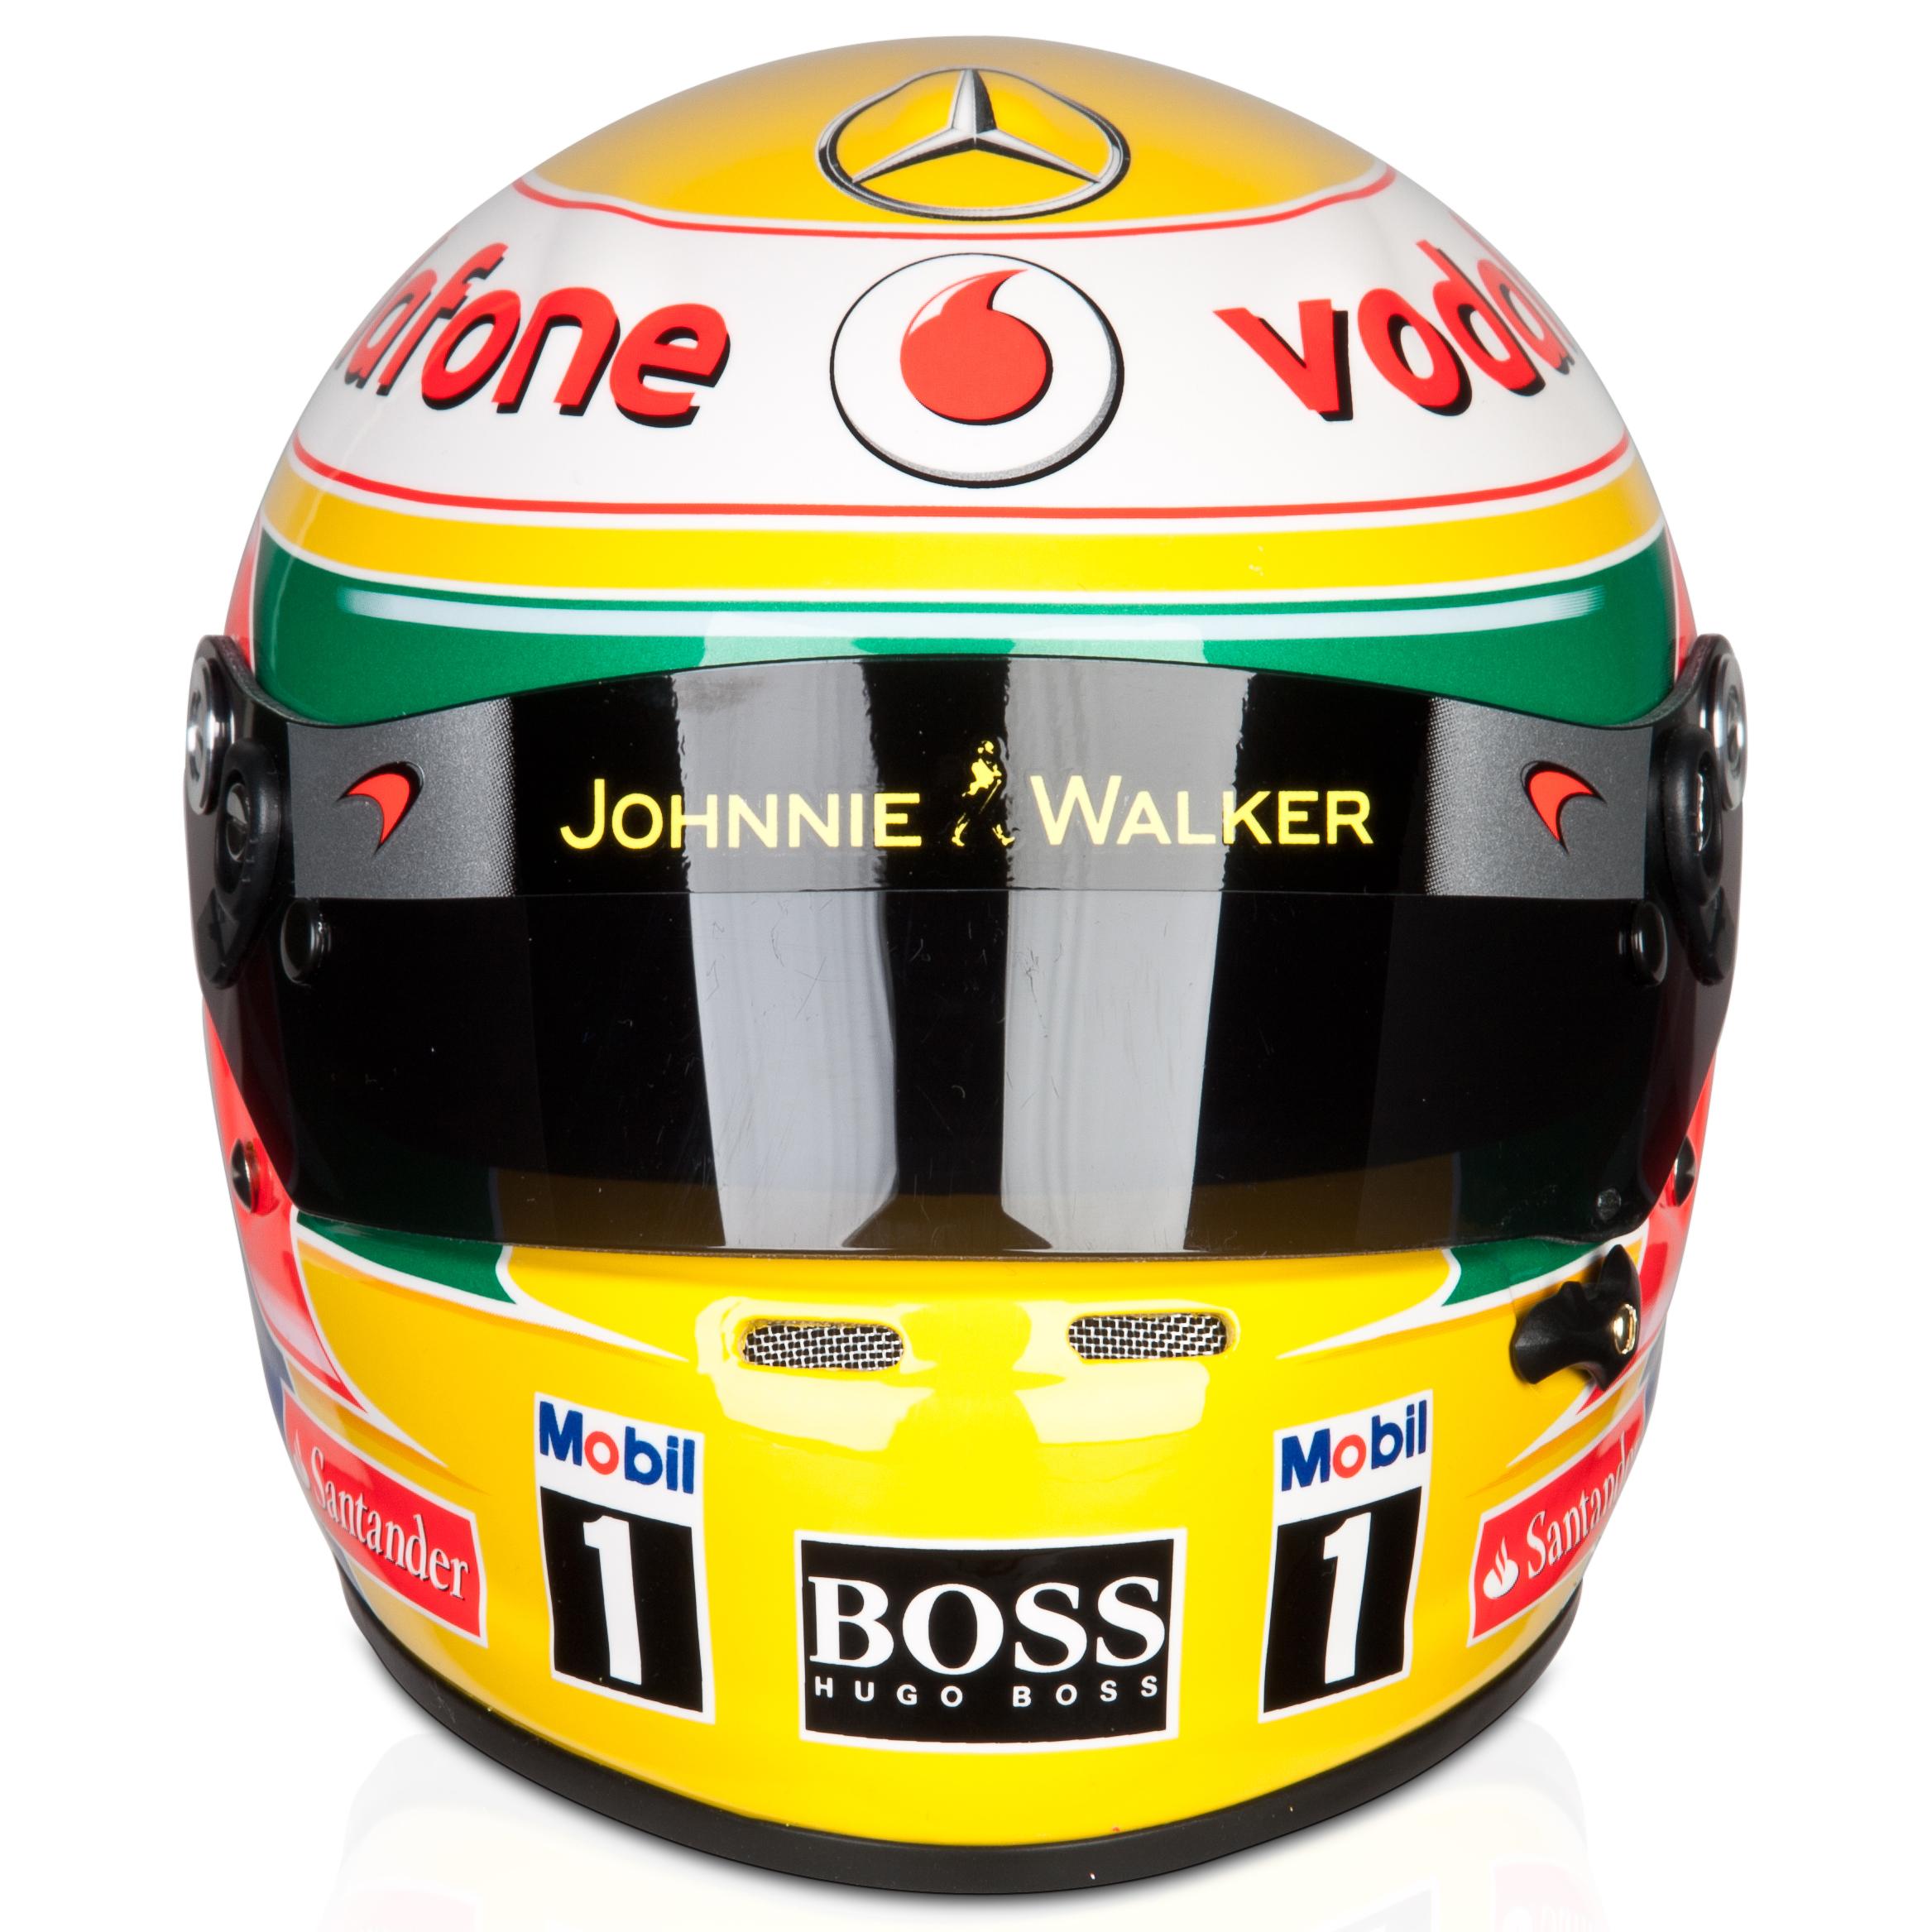 Vodafone McLaren Mercedes Lewis Hamilton 2012 Helmet 1:2 Scale. for 80€